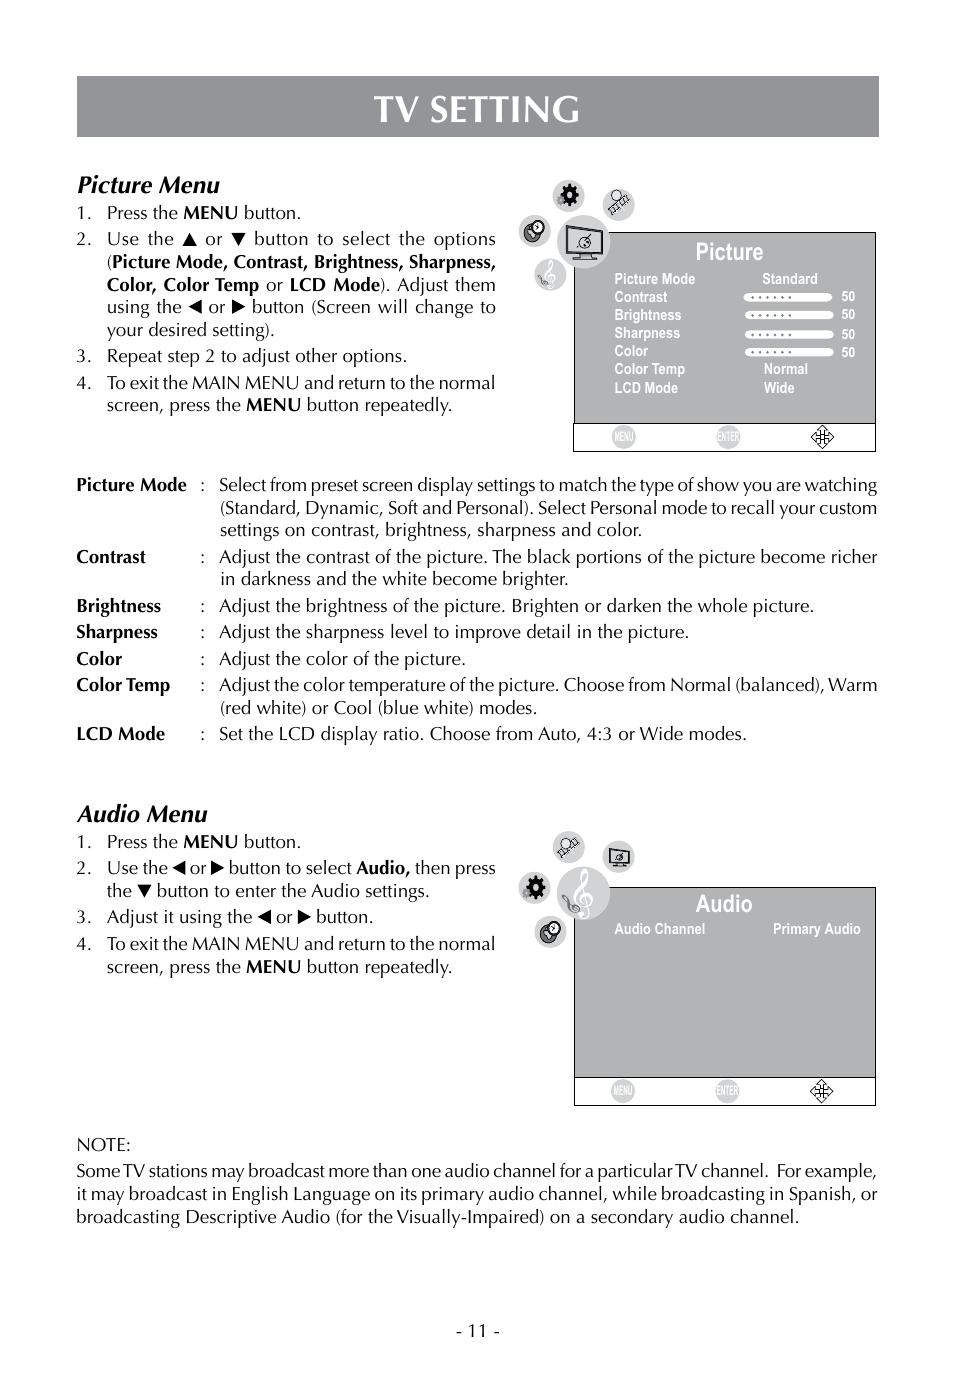 tv setting picture menu audio menu venturer plv16070 user manual rh manualsdir com Polaroid 3200 LCD TV Manual Polaroid 3200 LCD TV Manual